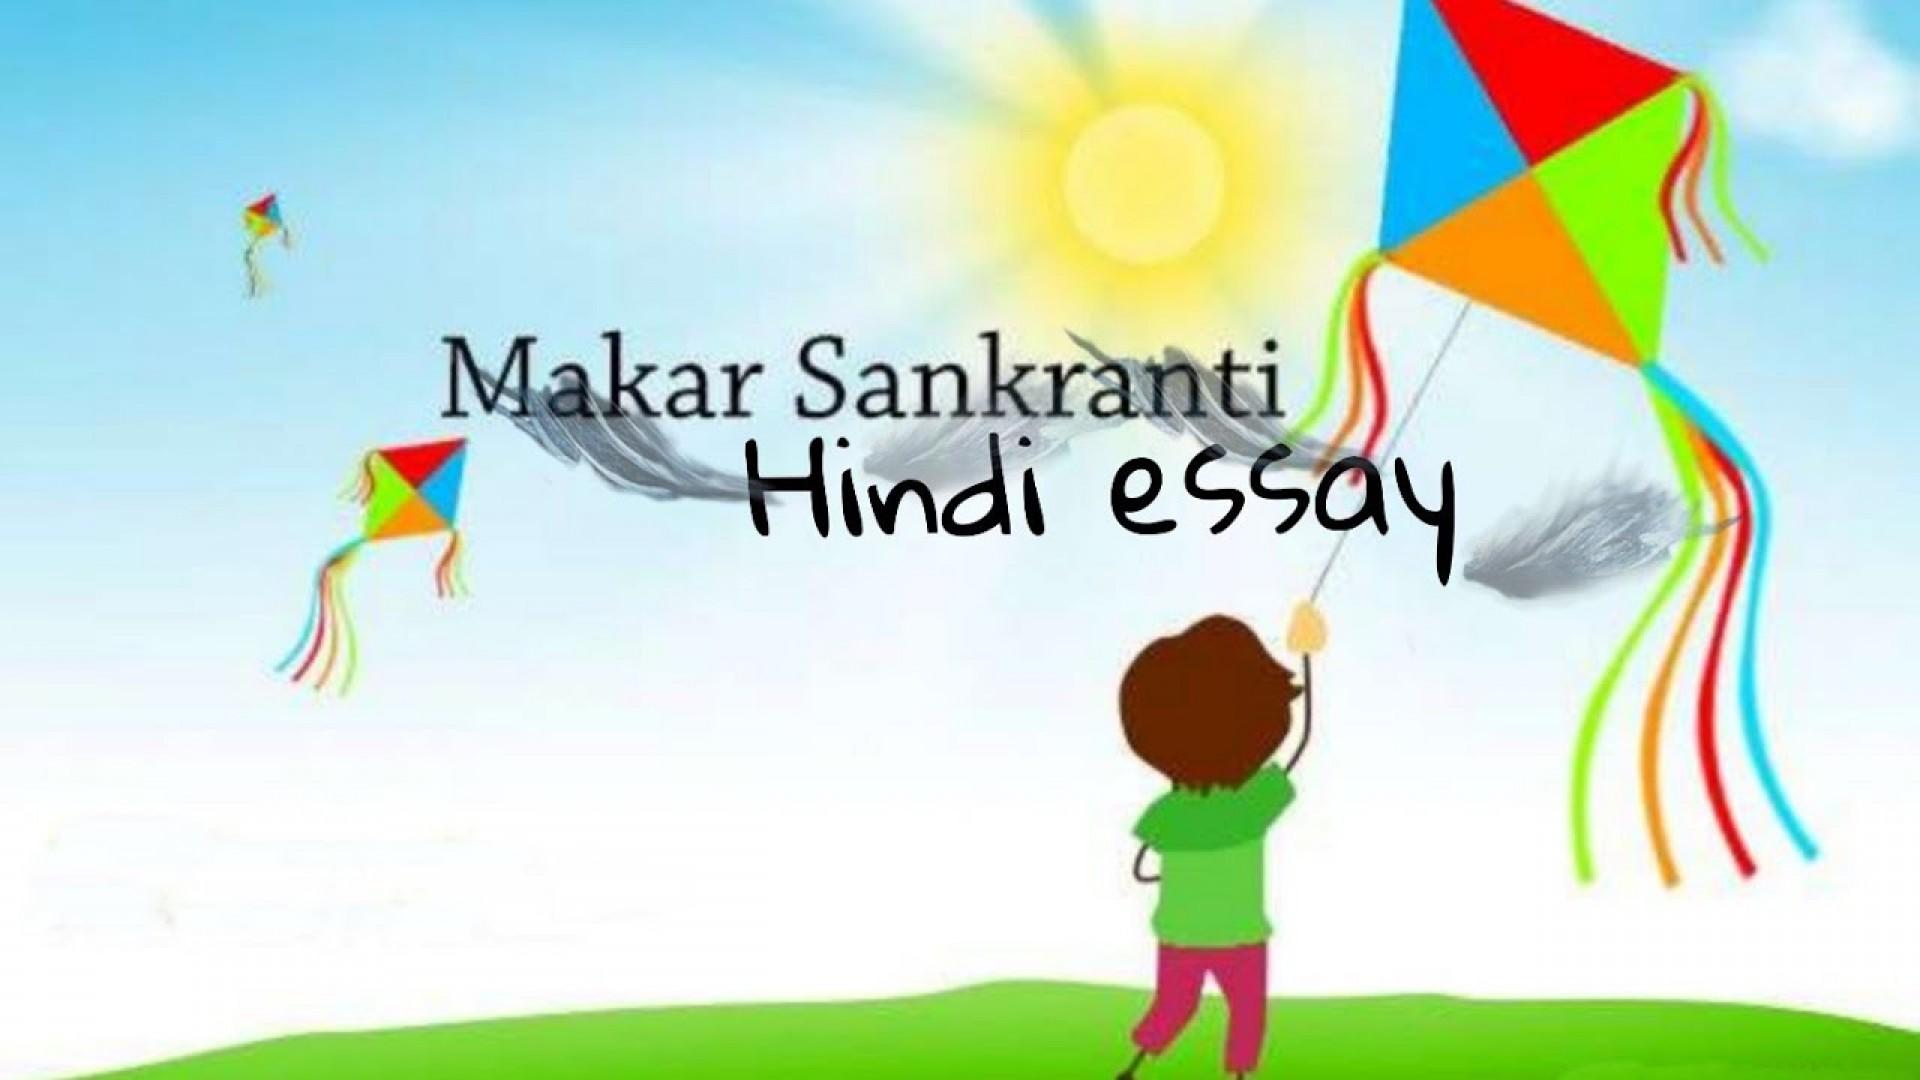 003 Makar Sankranti In Hindi Essay Example Surprising Pdf Download 2018 1920